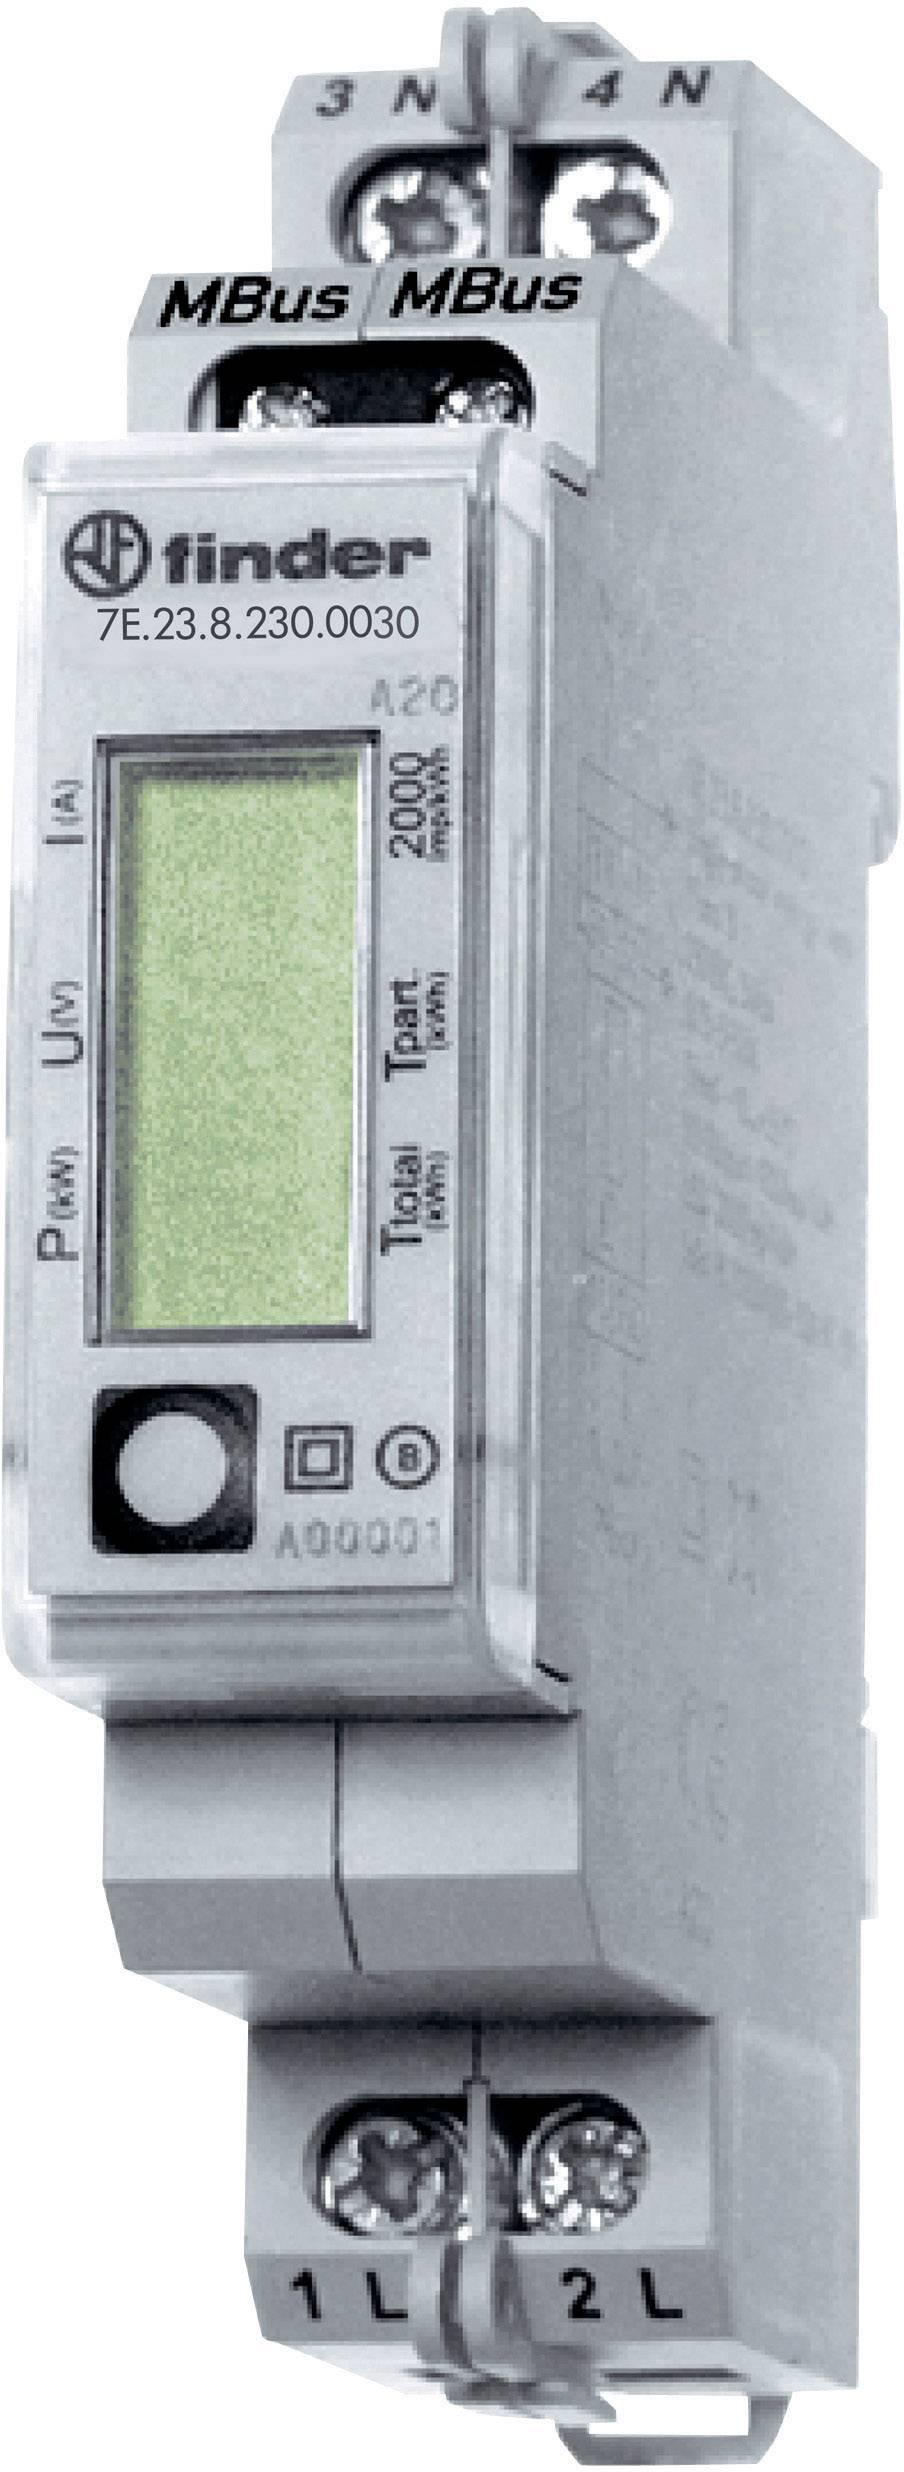 Jednofázový elektroměr Finder 32 A MID M-Bus, na DIN lištu